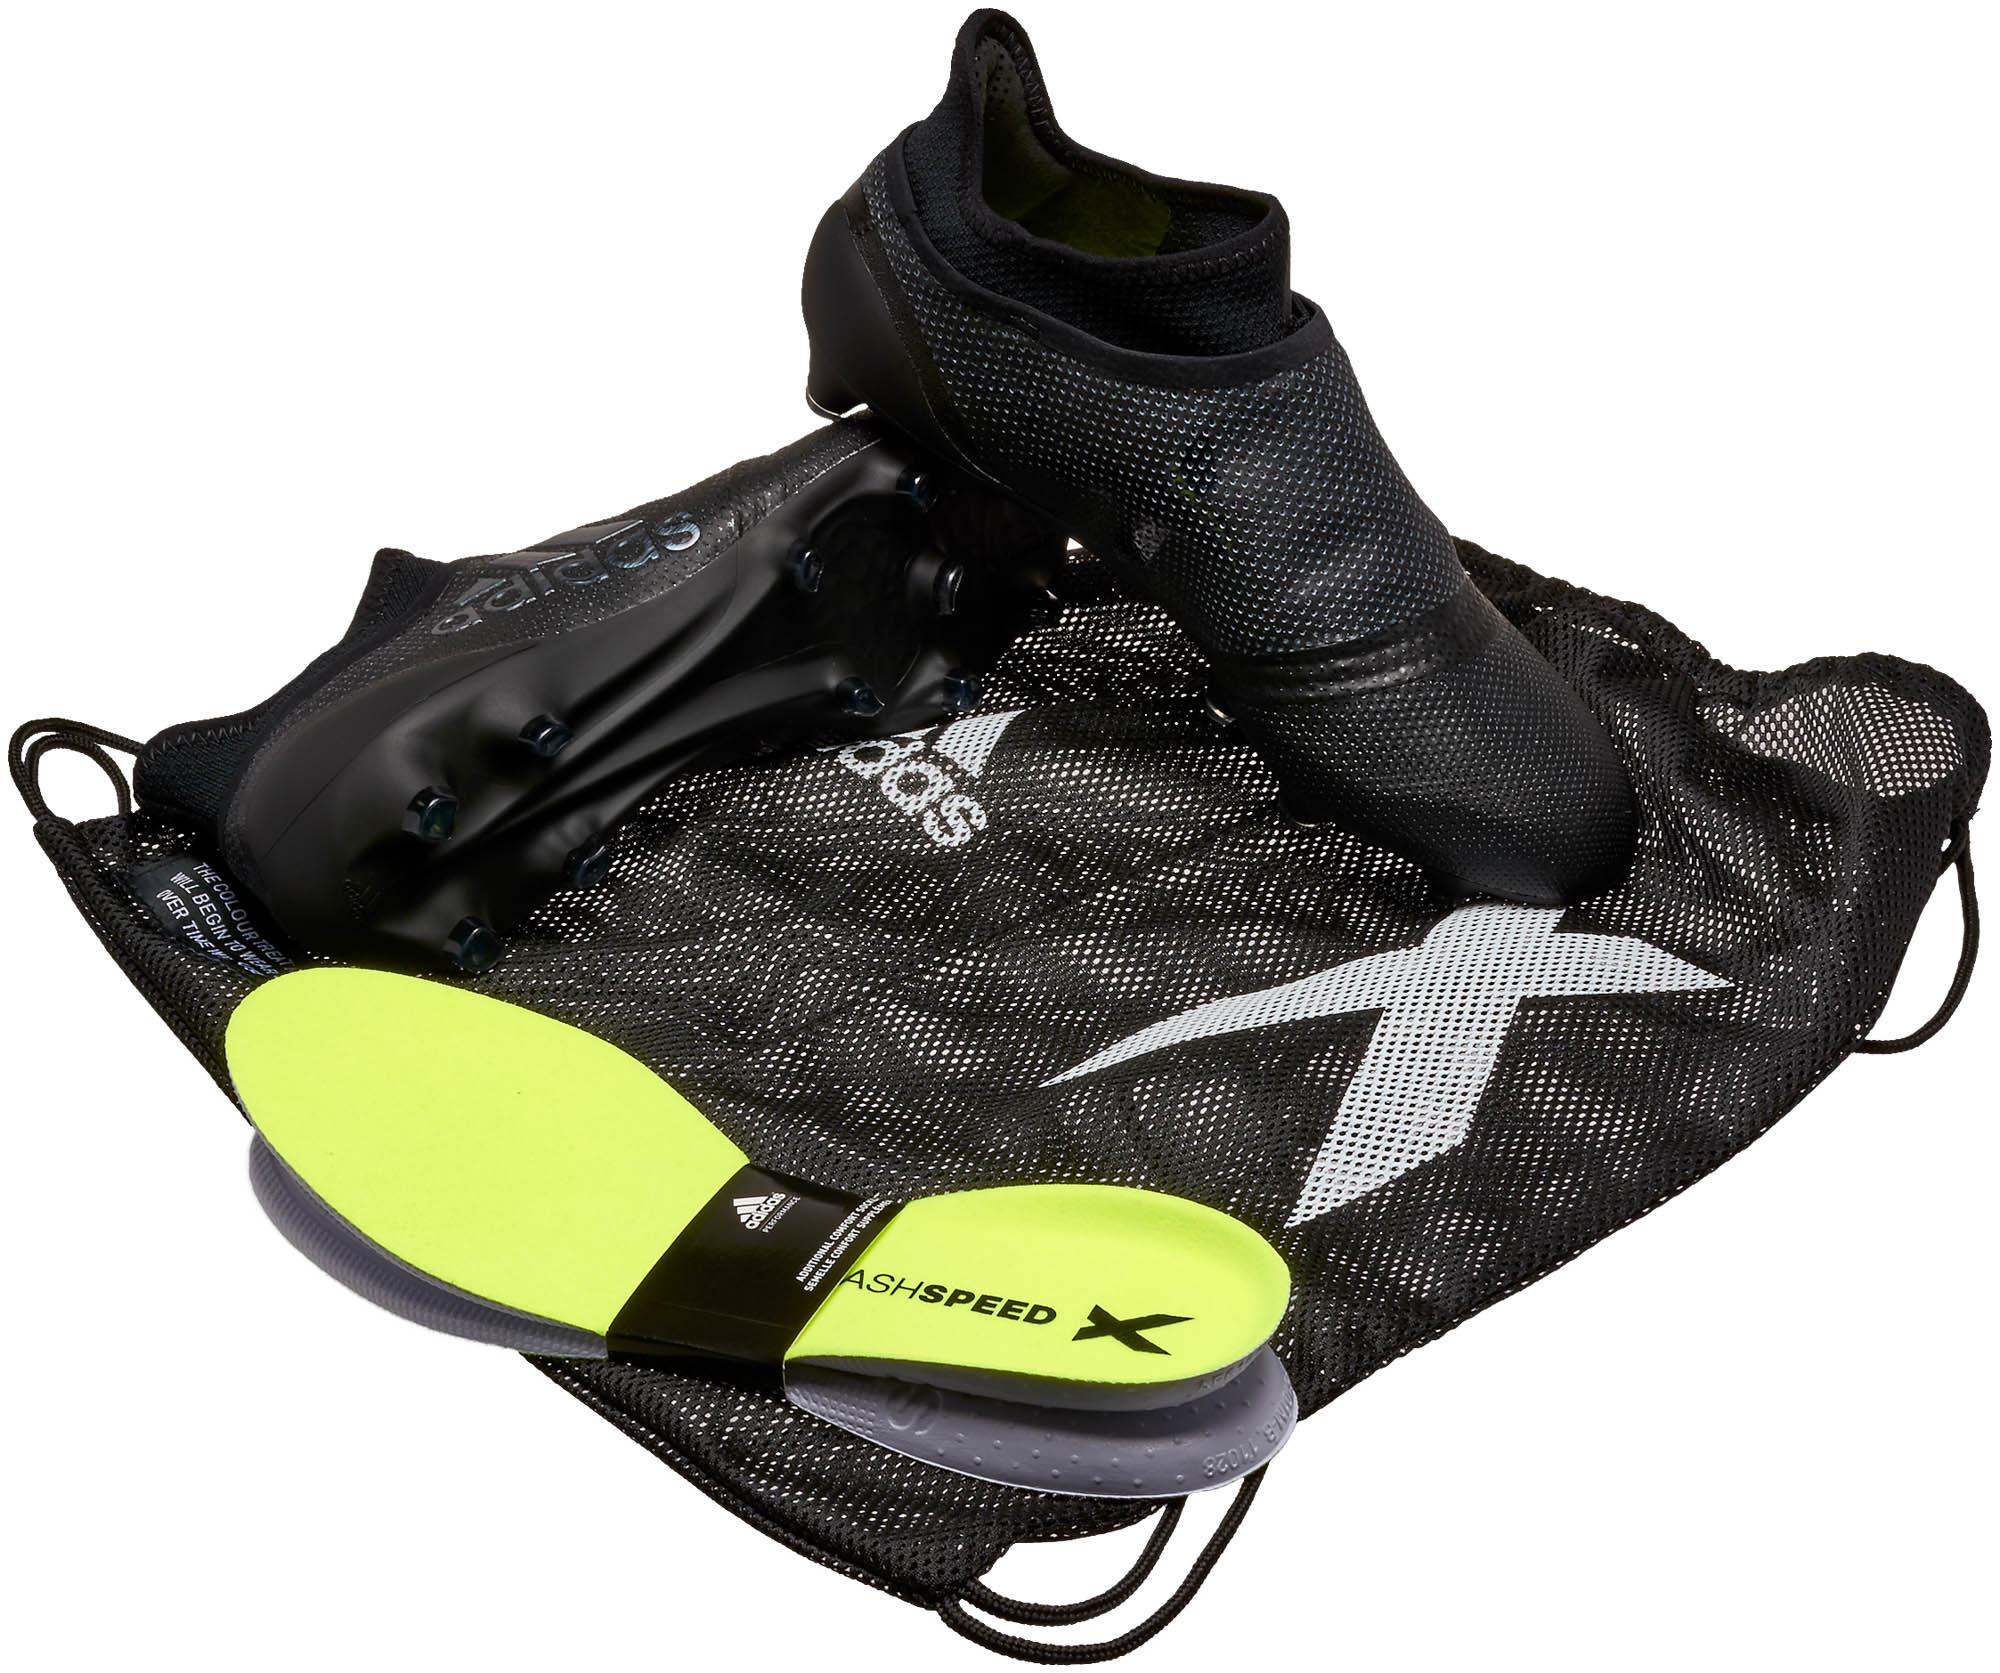 size 40 3b036 93d54 adidas x 17+ purespeed unisport shoes black pants